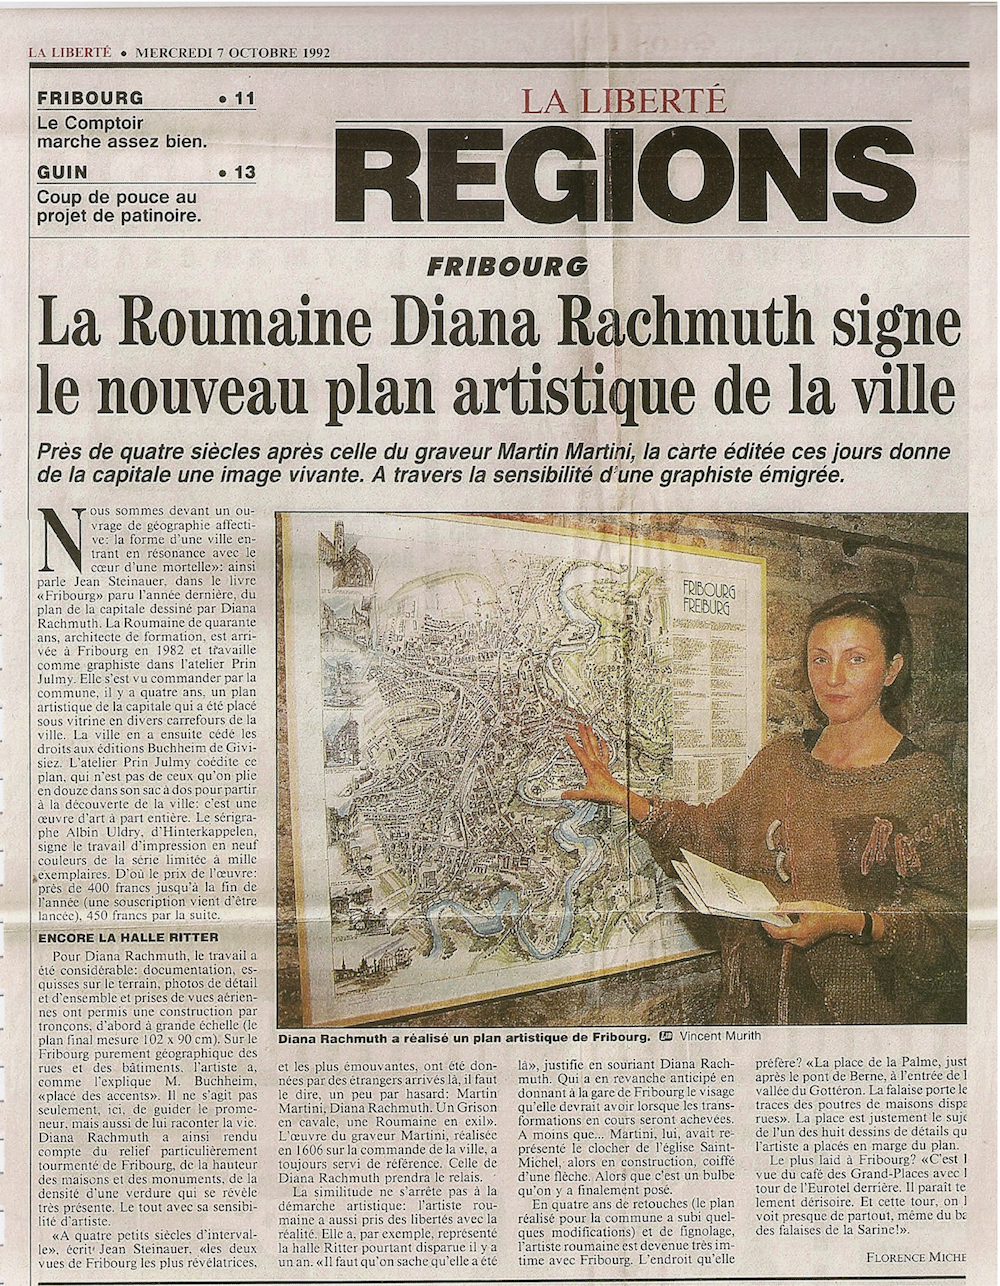 Article paru dans La Liberté - 7 octobre 1992